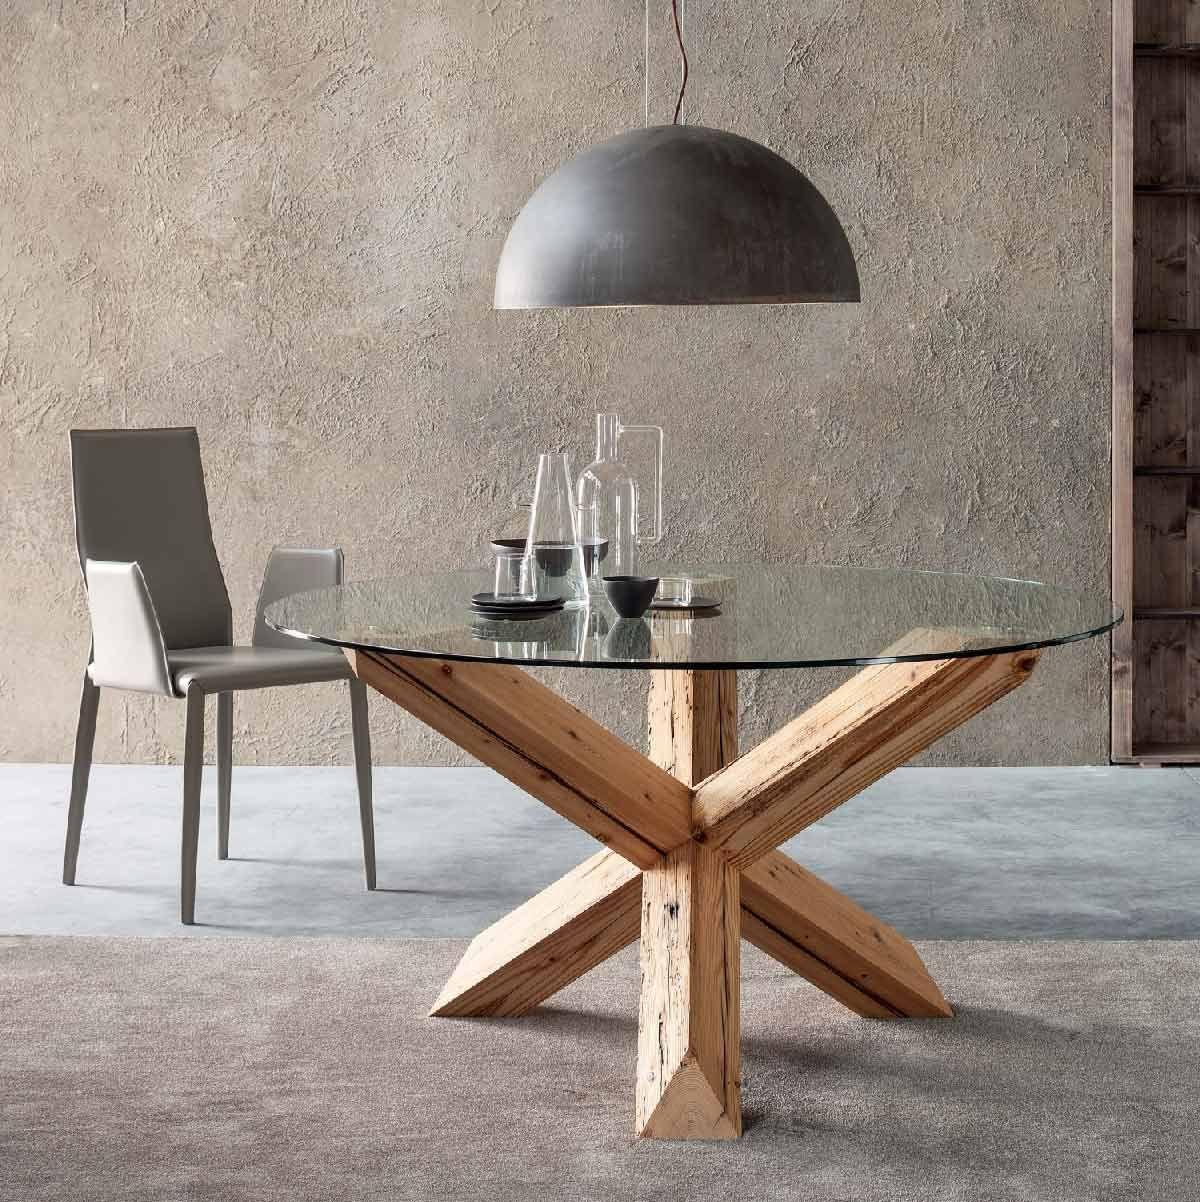 SEDIT Tavoli rotondi in legno Travo Tavolo rotondo